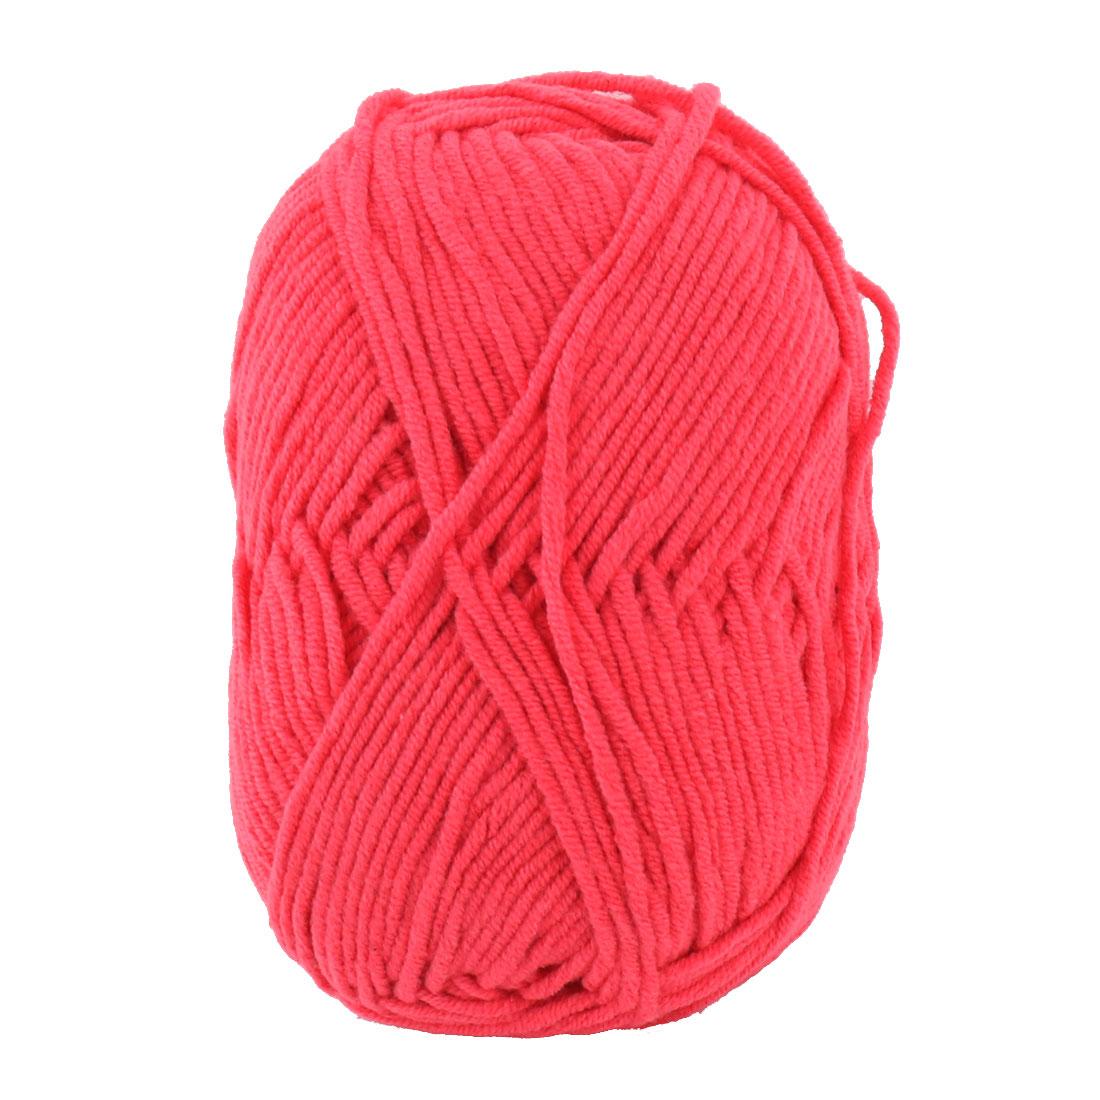 Festival DIY Handcraft Scarf Sweater Crochet Yarn String Cord Rope Hot Pink 50g - image 3 of 3